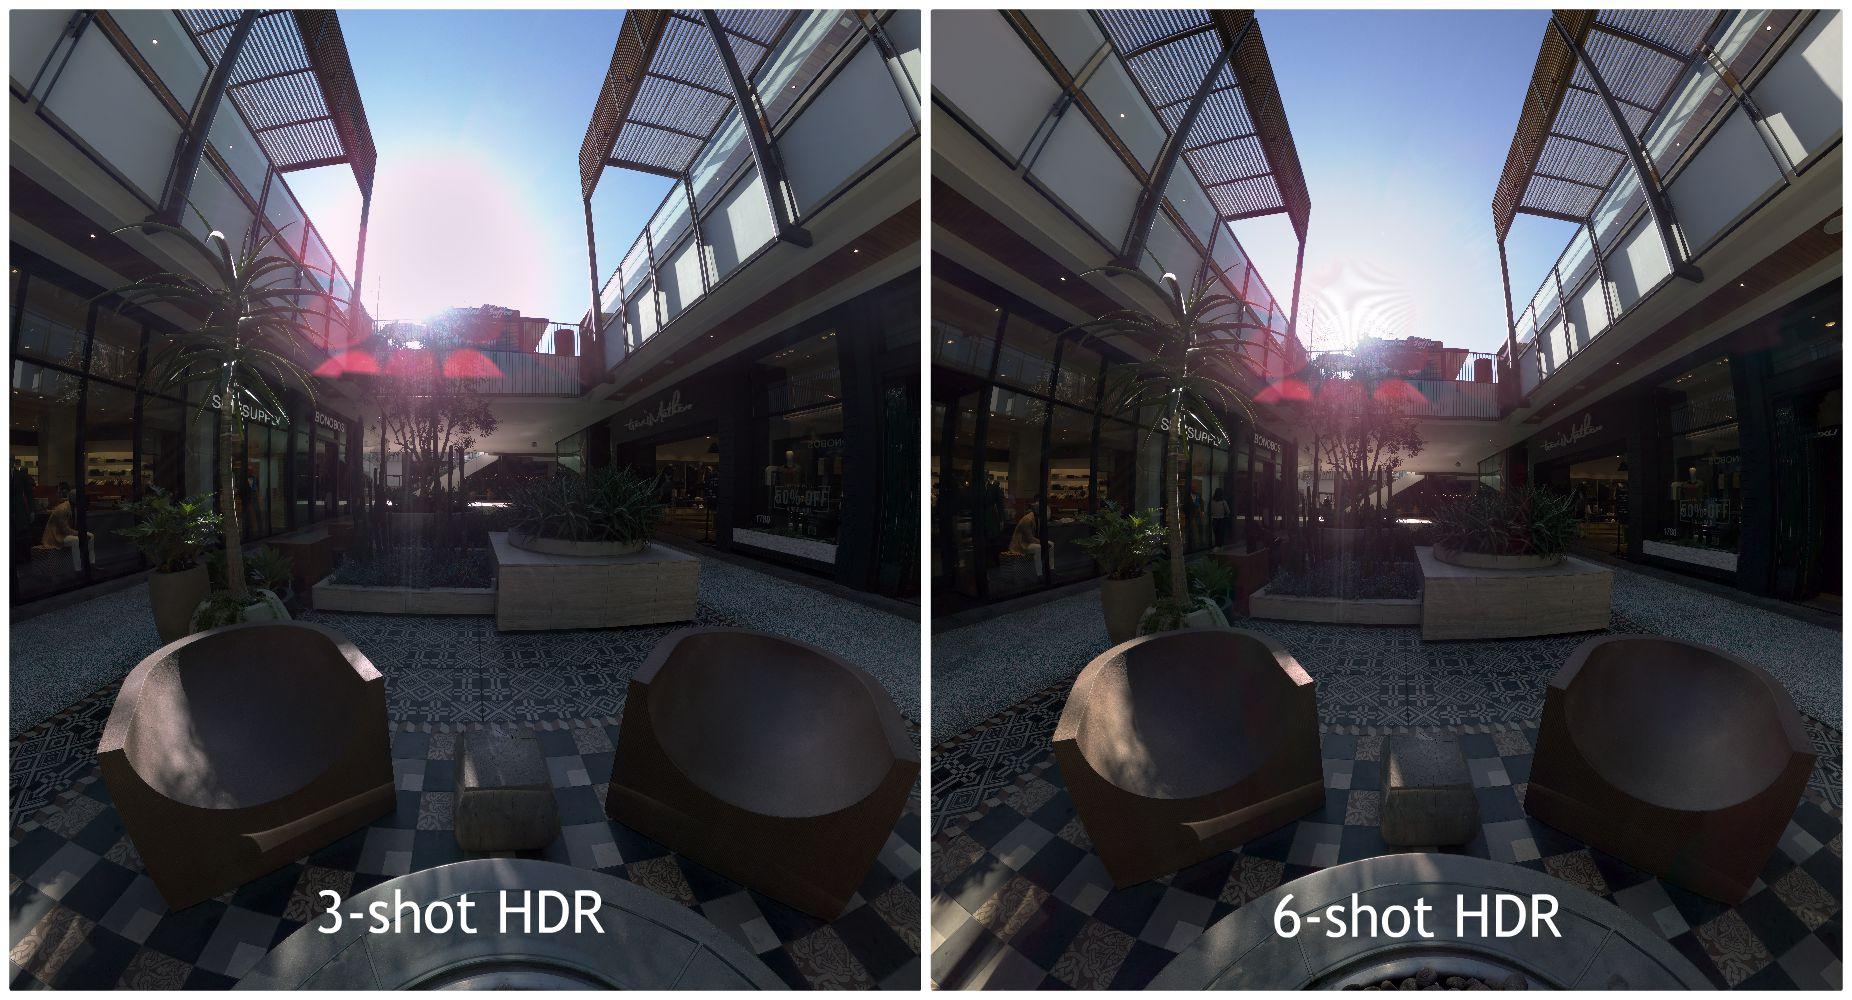 XPhase Pro S - 3-shot vs. 6-shot HDR